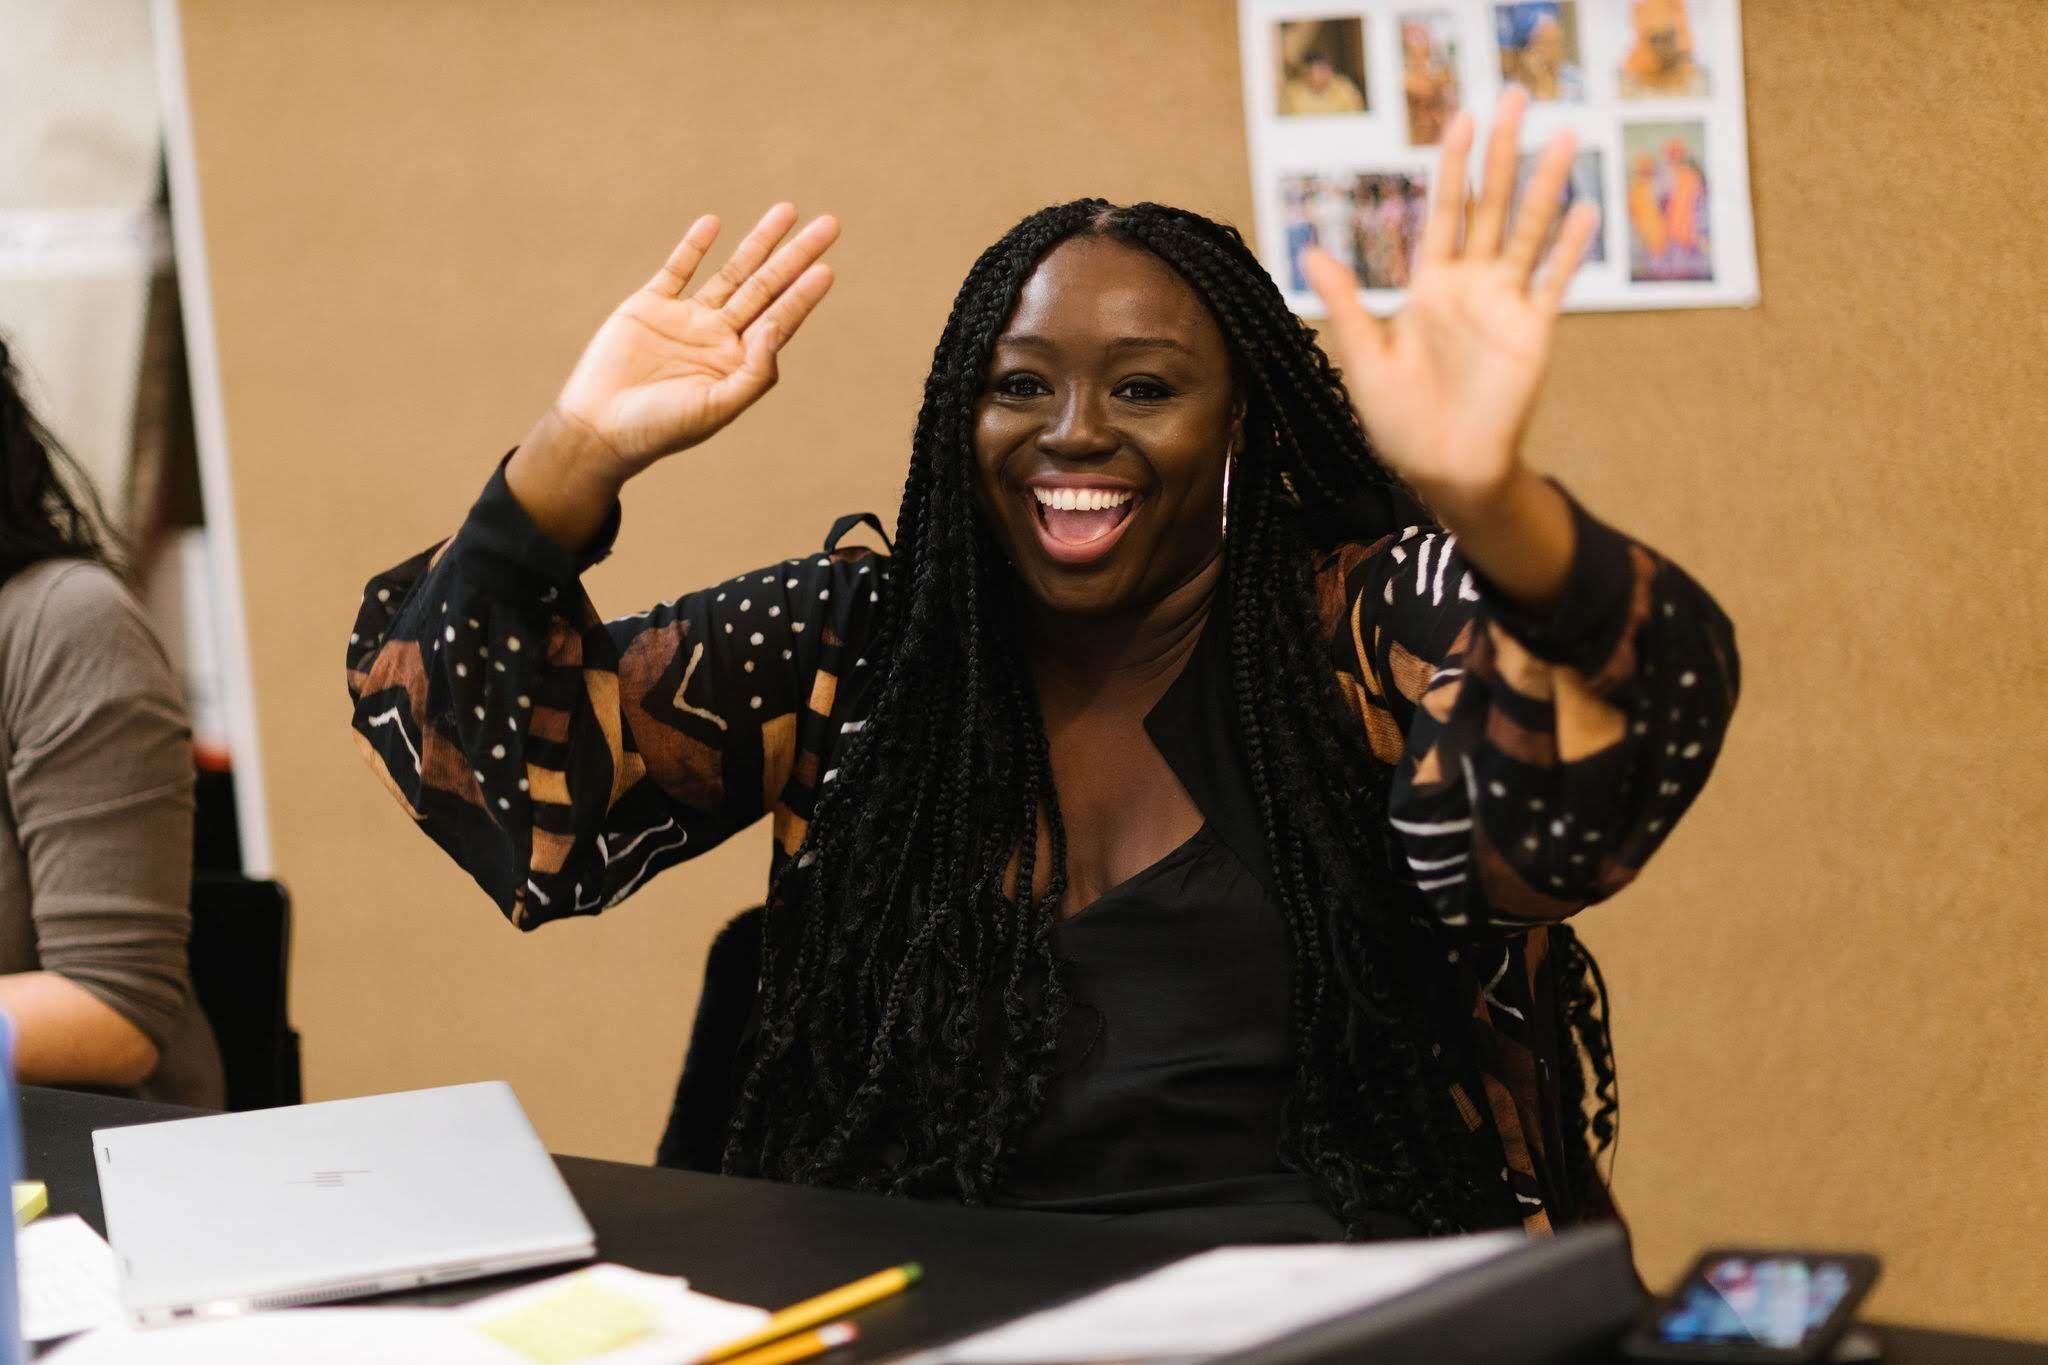 Jocelyn Bioh in rehearsals for Nollywood Dreams